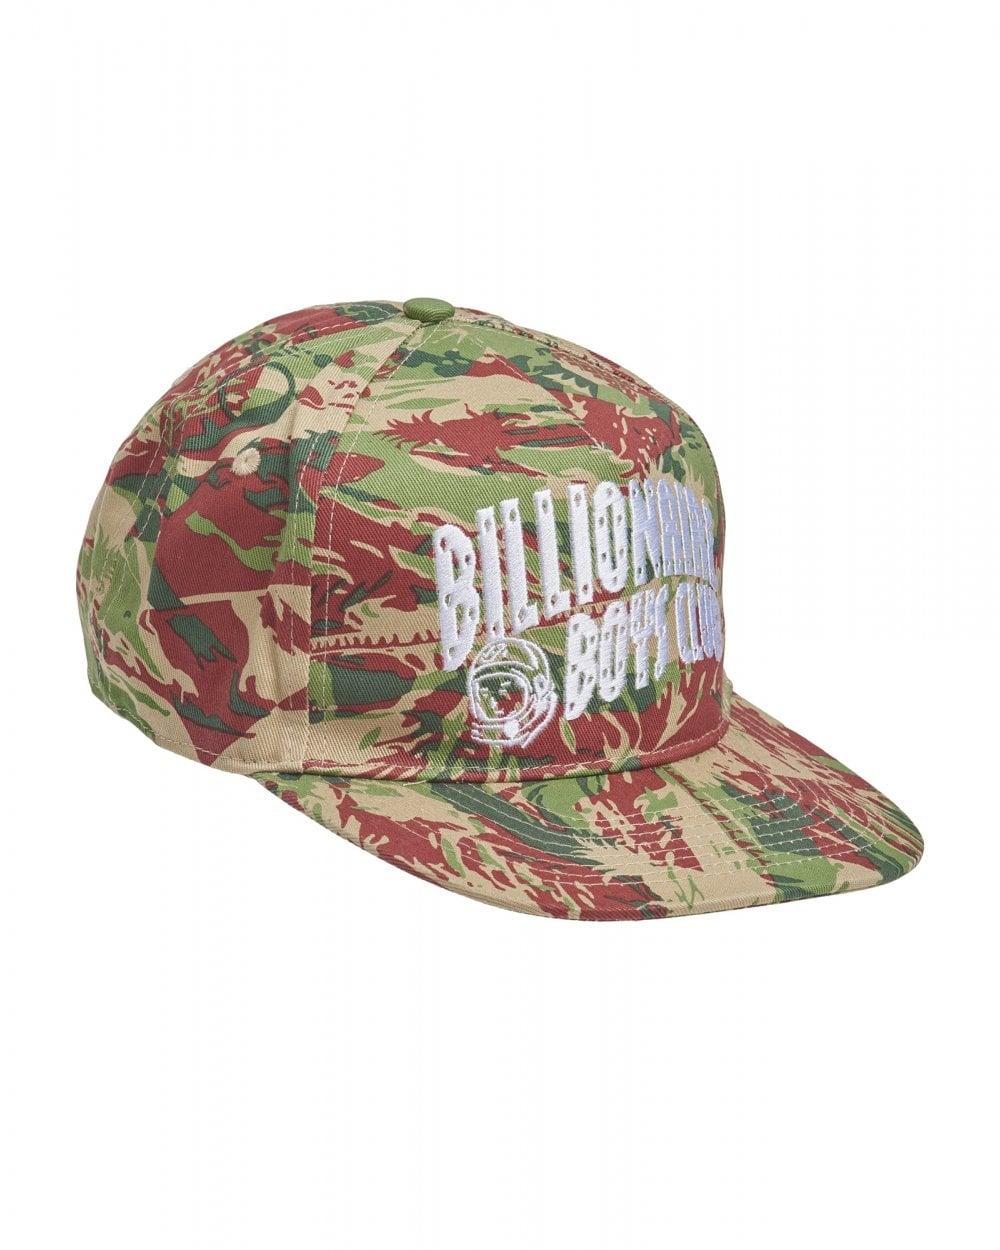 5b14bdf85 Billionaire Boys Club Mens Lizard Camo Print Snapback Cap, Logo Hat